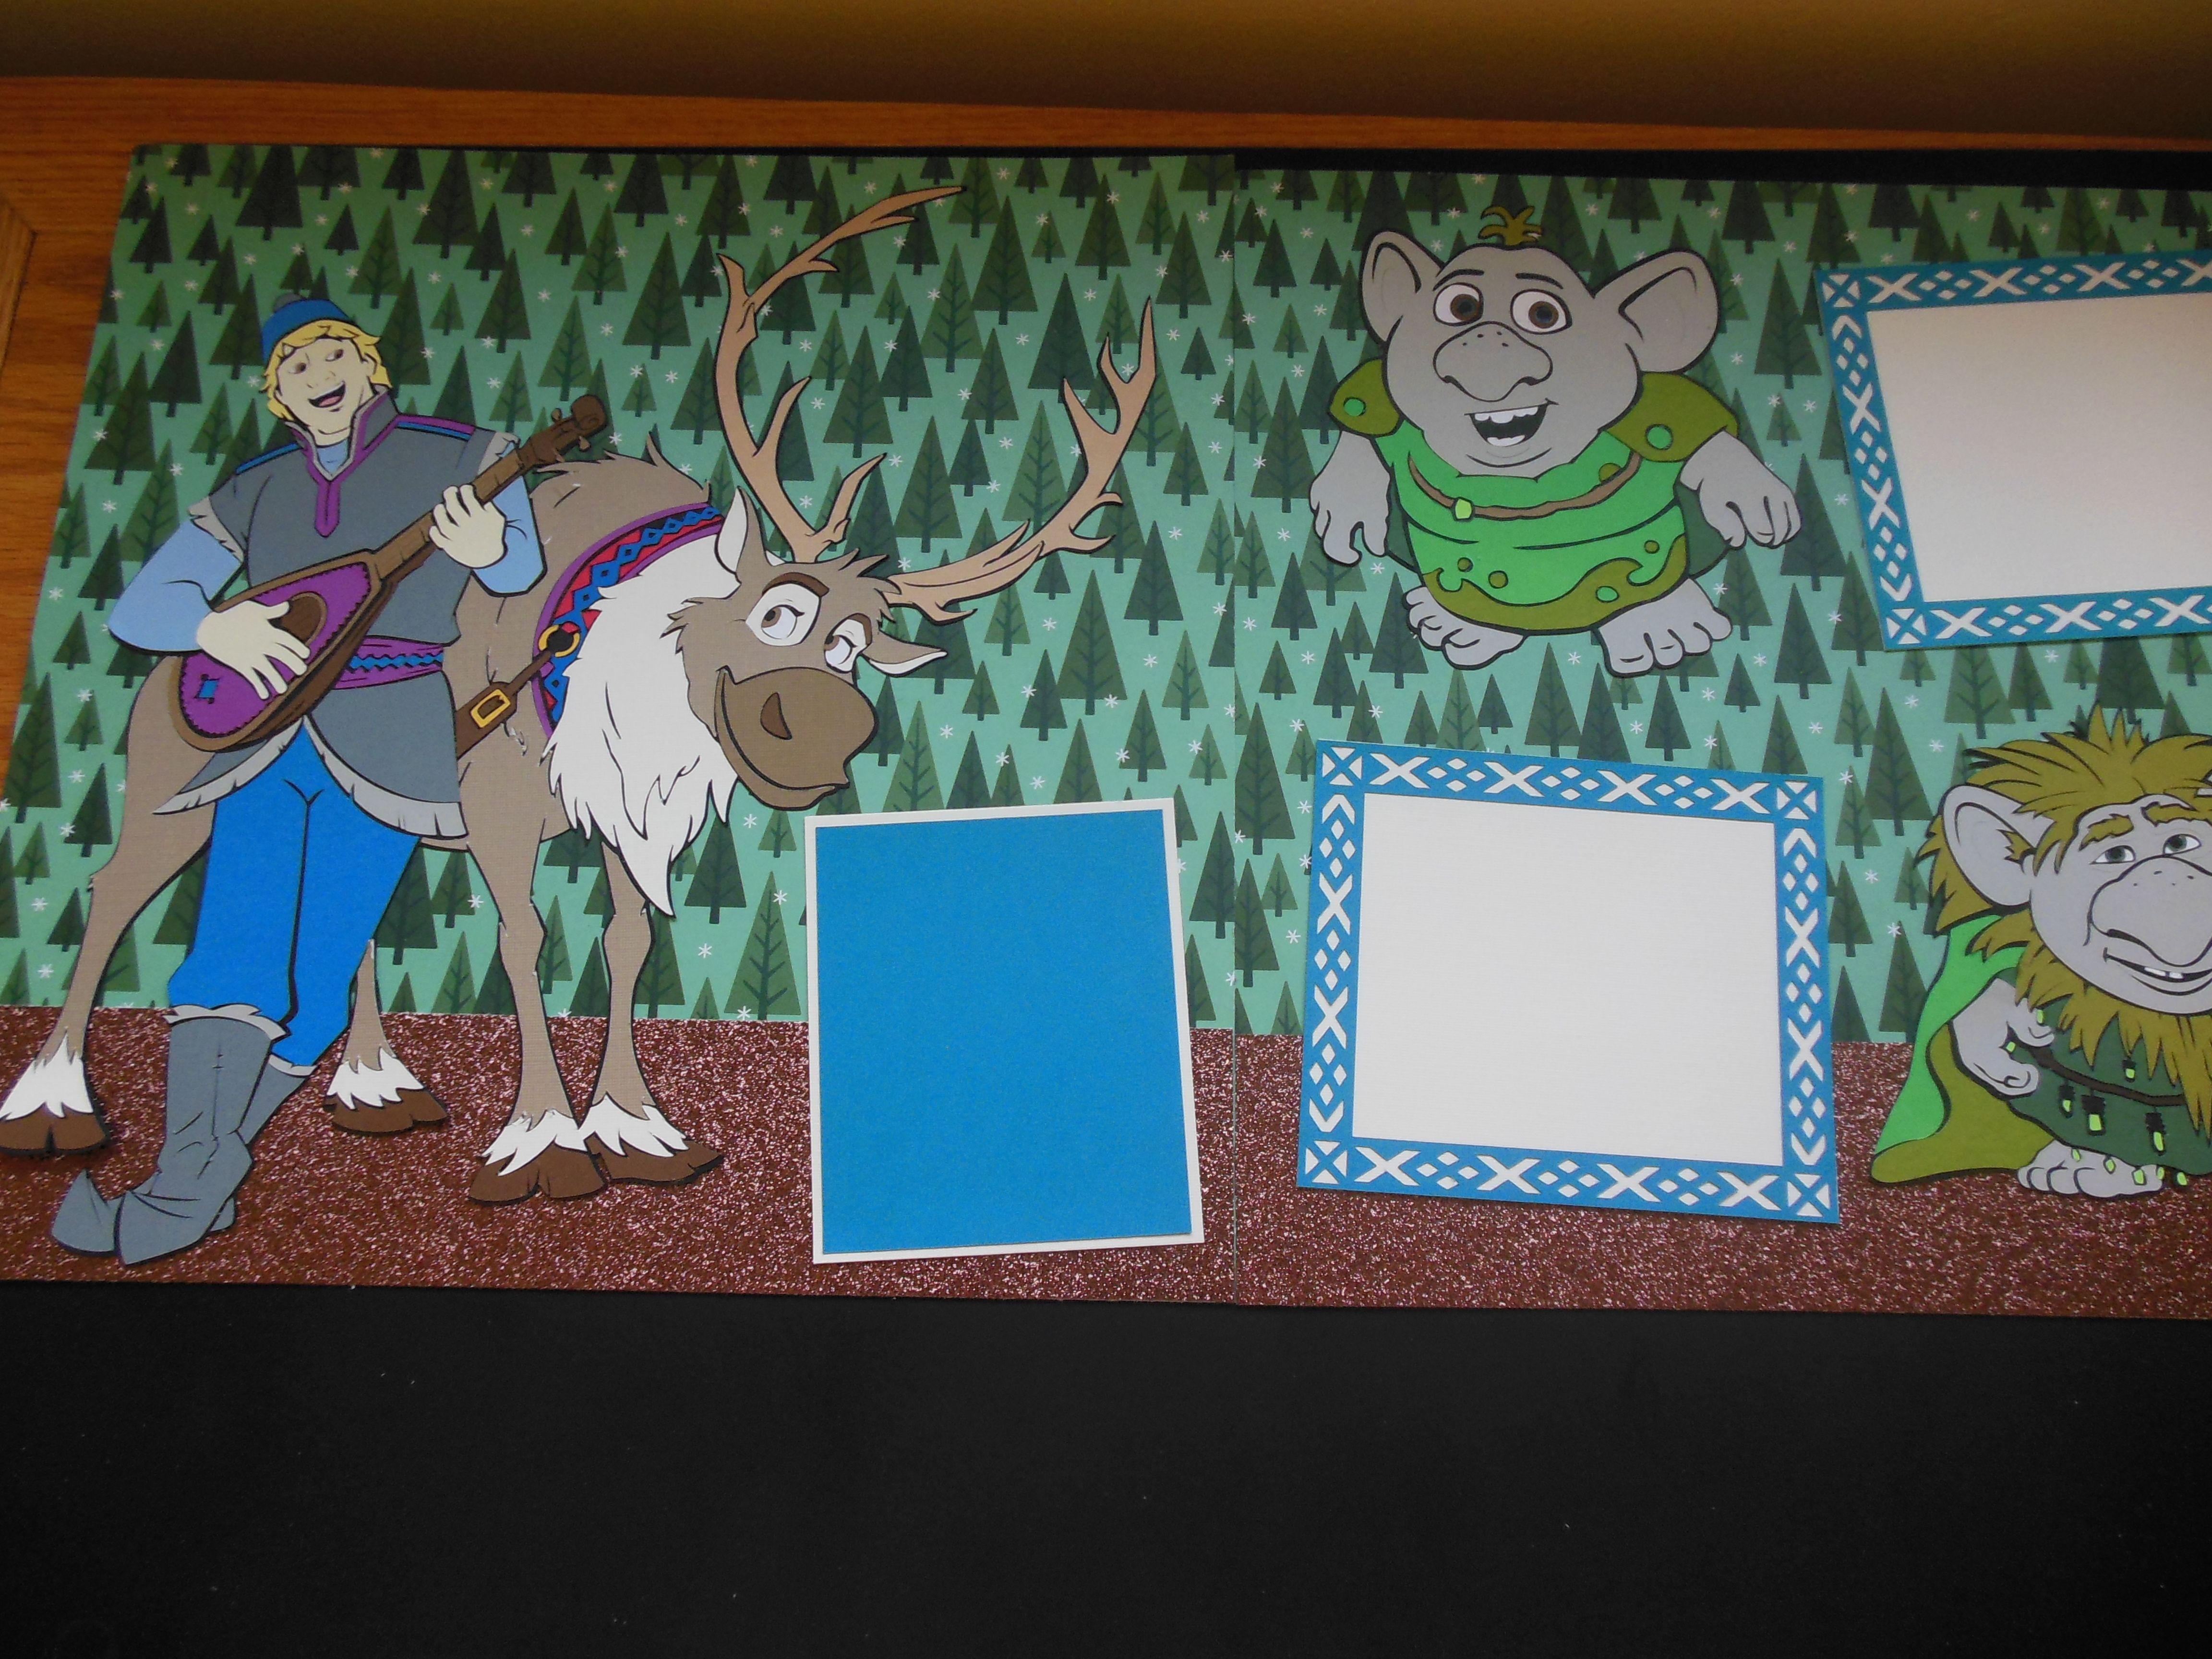 Scrapbook ideas using cricut - Kristoff Sven And Trolls Using The Cricut Frozen Cartridge For A Disneyland Album Frozen Scrapbookdisney Scrapbookscrapbook Layoutsfrozen